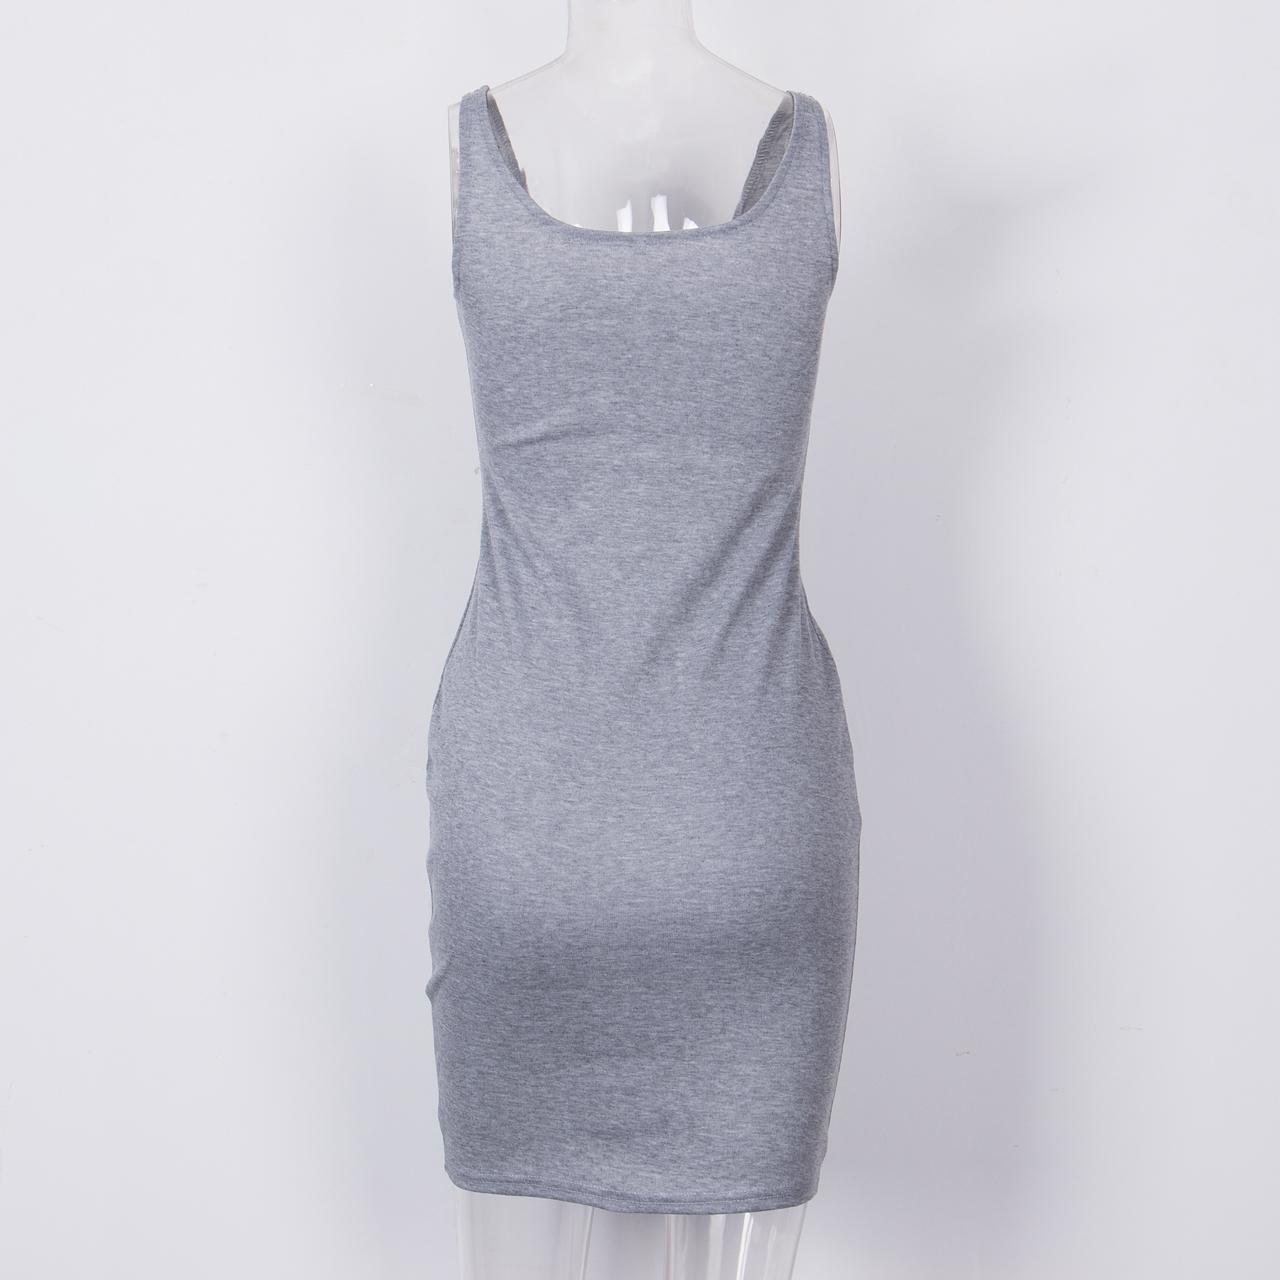 Swaggy HTB1ty8LMgDqK1RjSZSyq6yxEVXah Graues ärmelloses Kleid